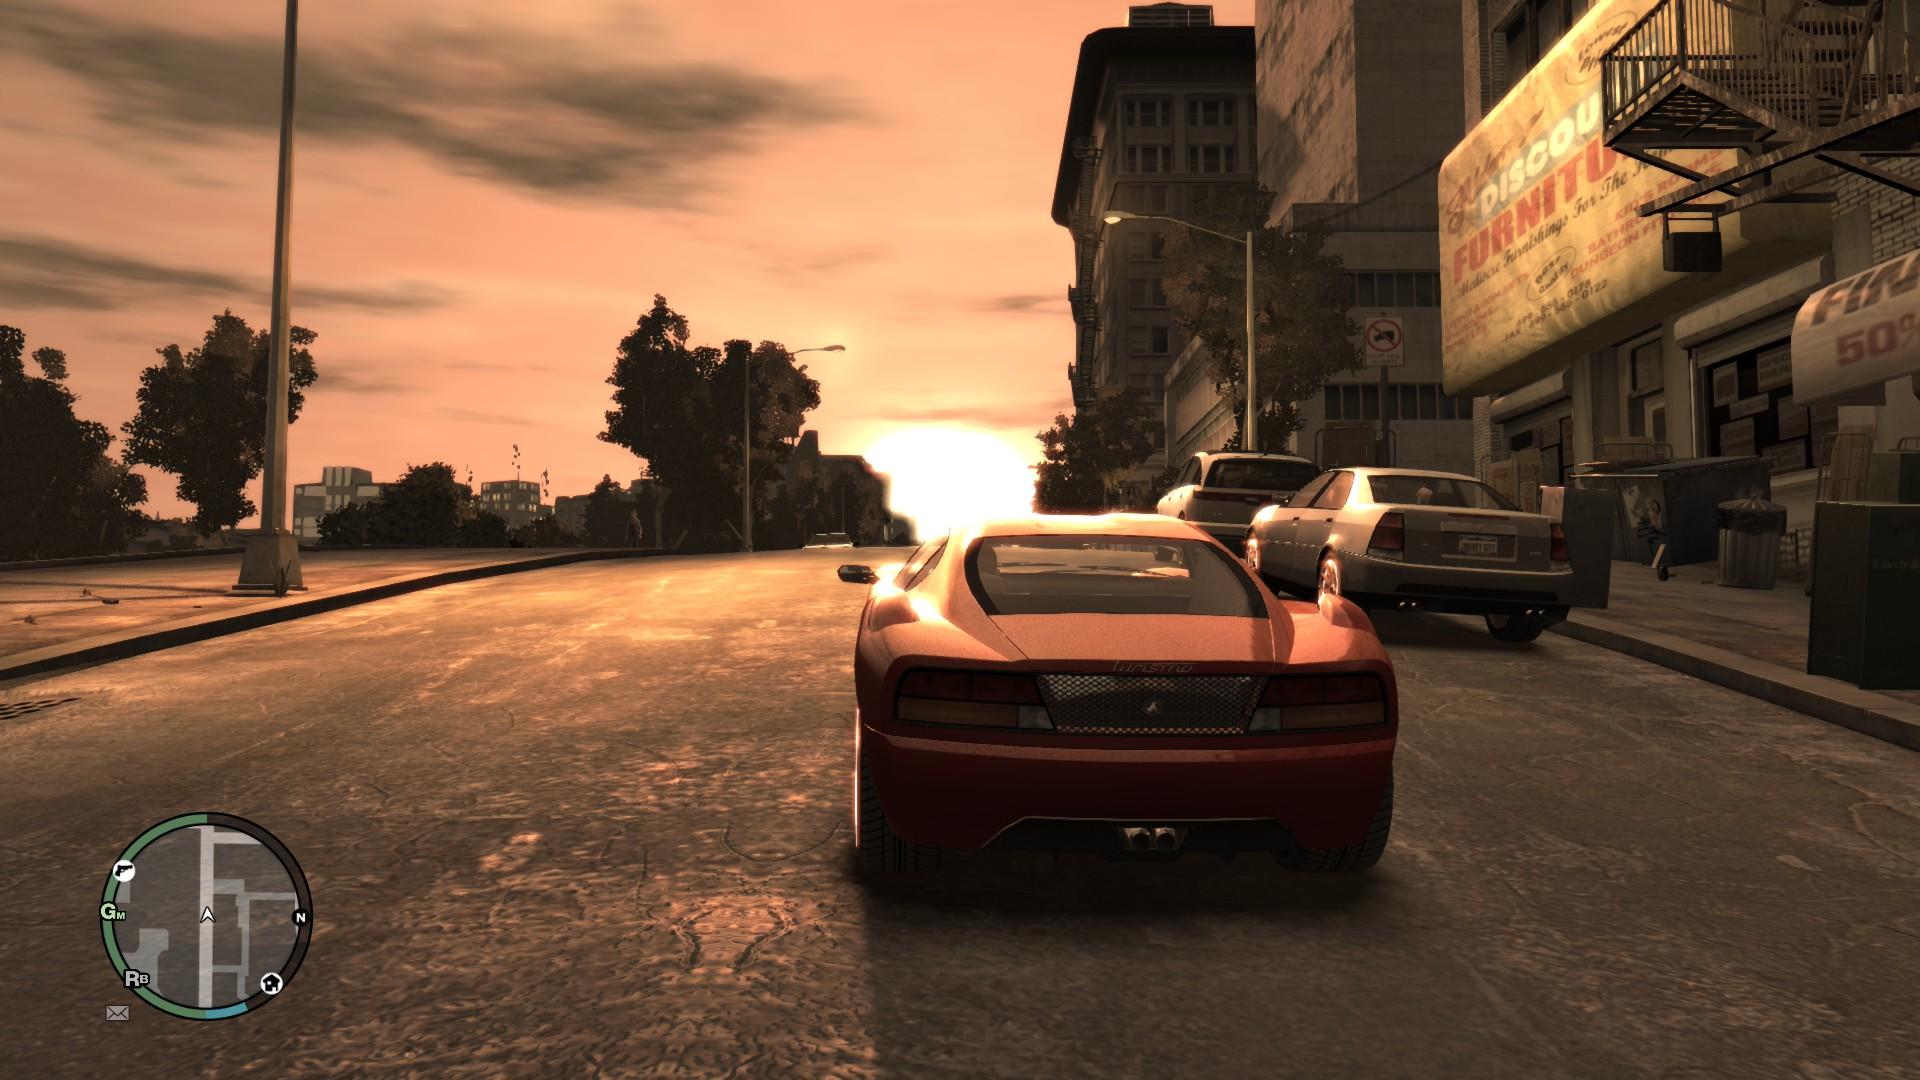 《GTA 4》部分被删除电台恢复 不过有玩家的存档没了